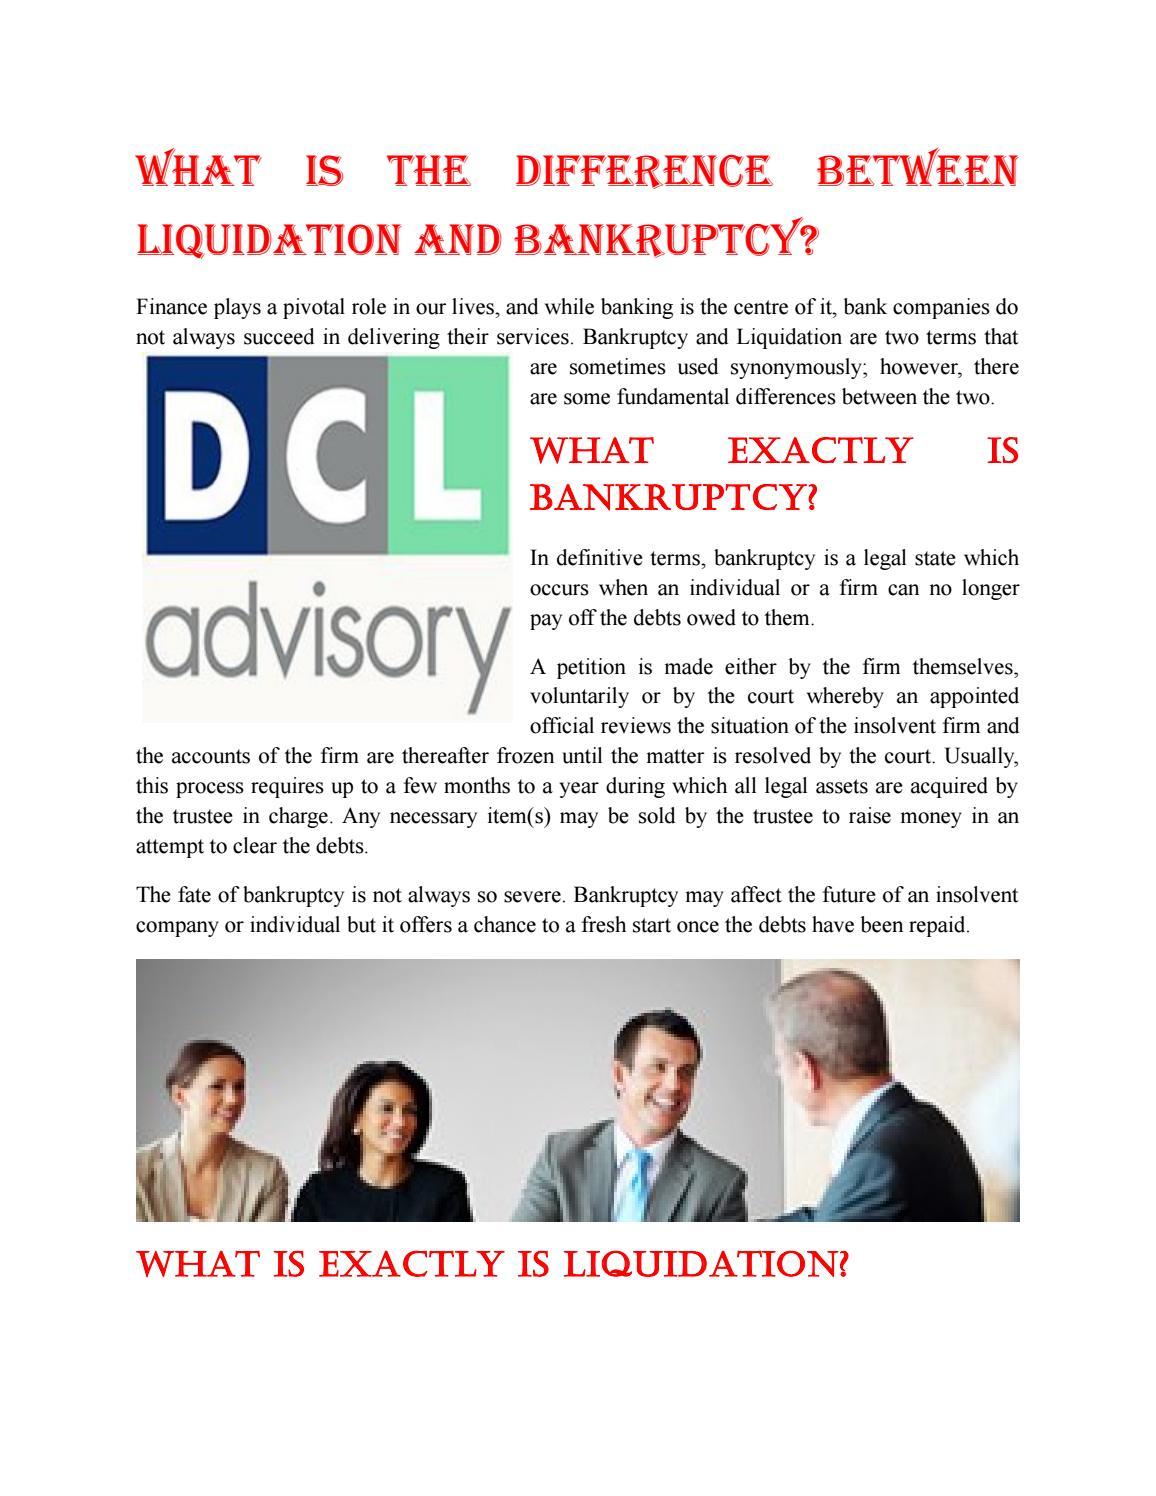 What is liquidation? 16